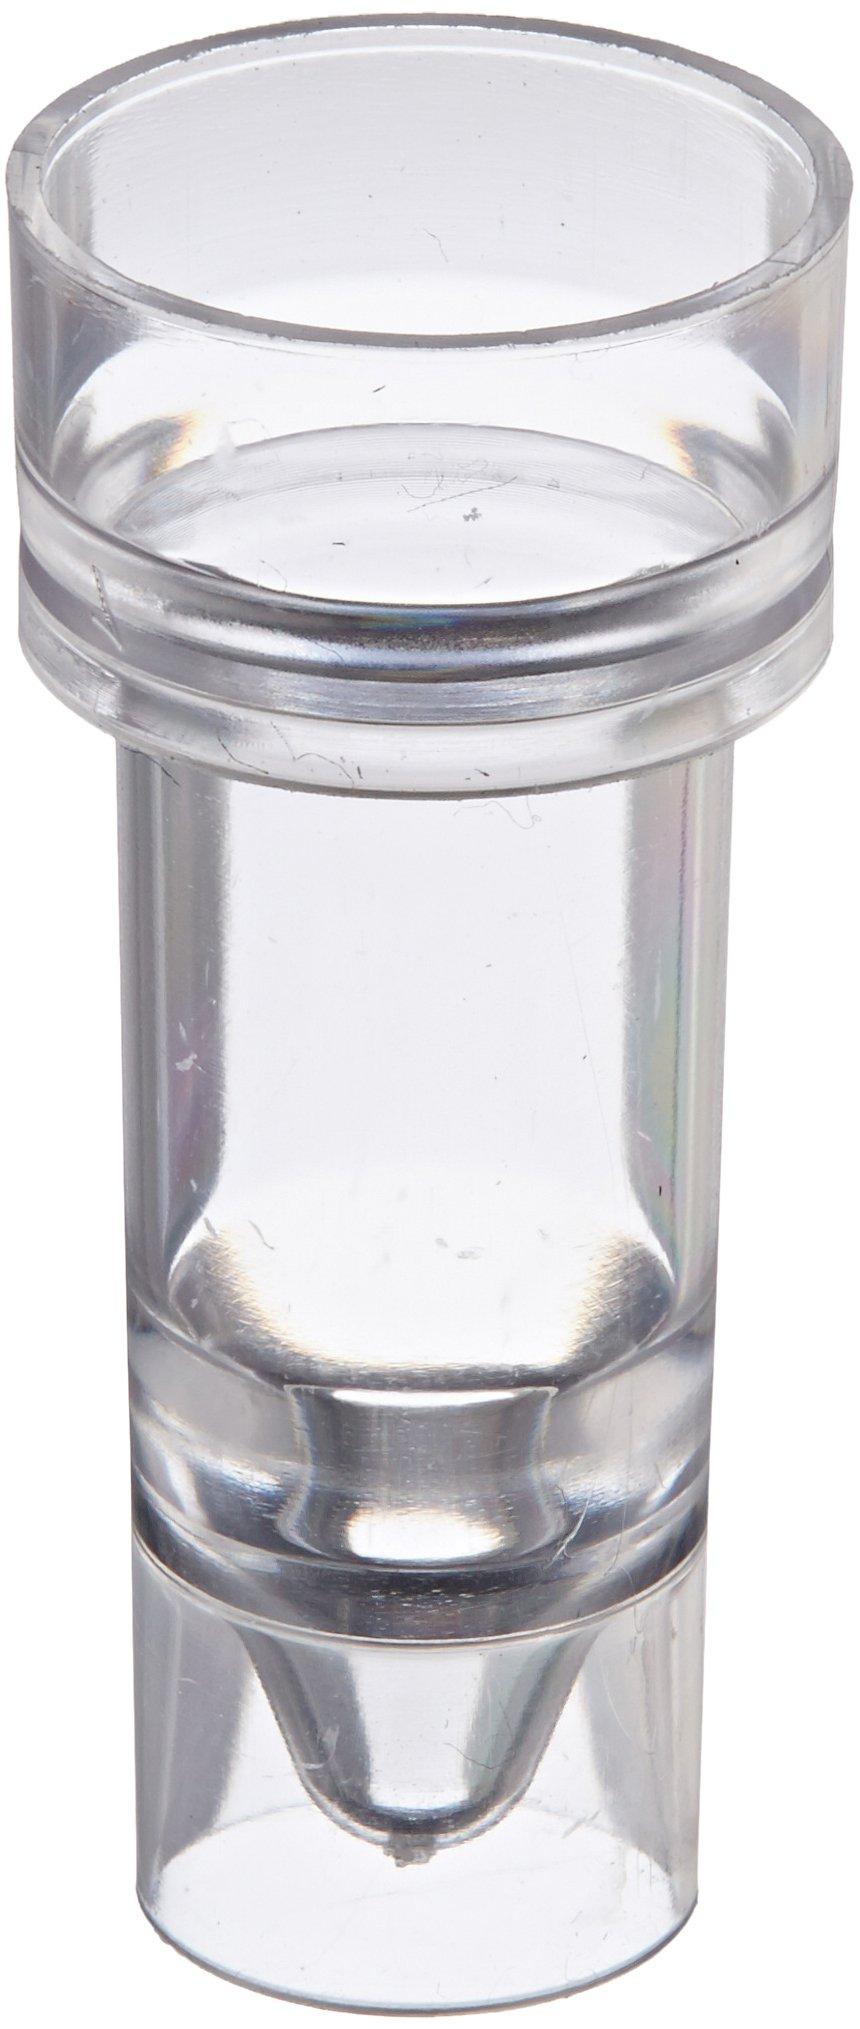 Globe Scientific 110911C Polystyrene Multi-Purpose Sample Cup, 3mL Capacity (Pack of 1000)